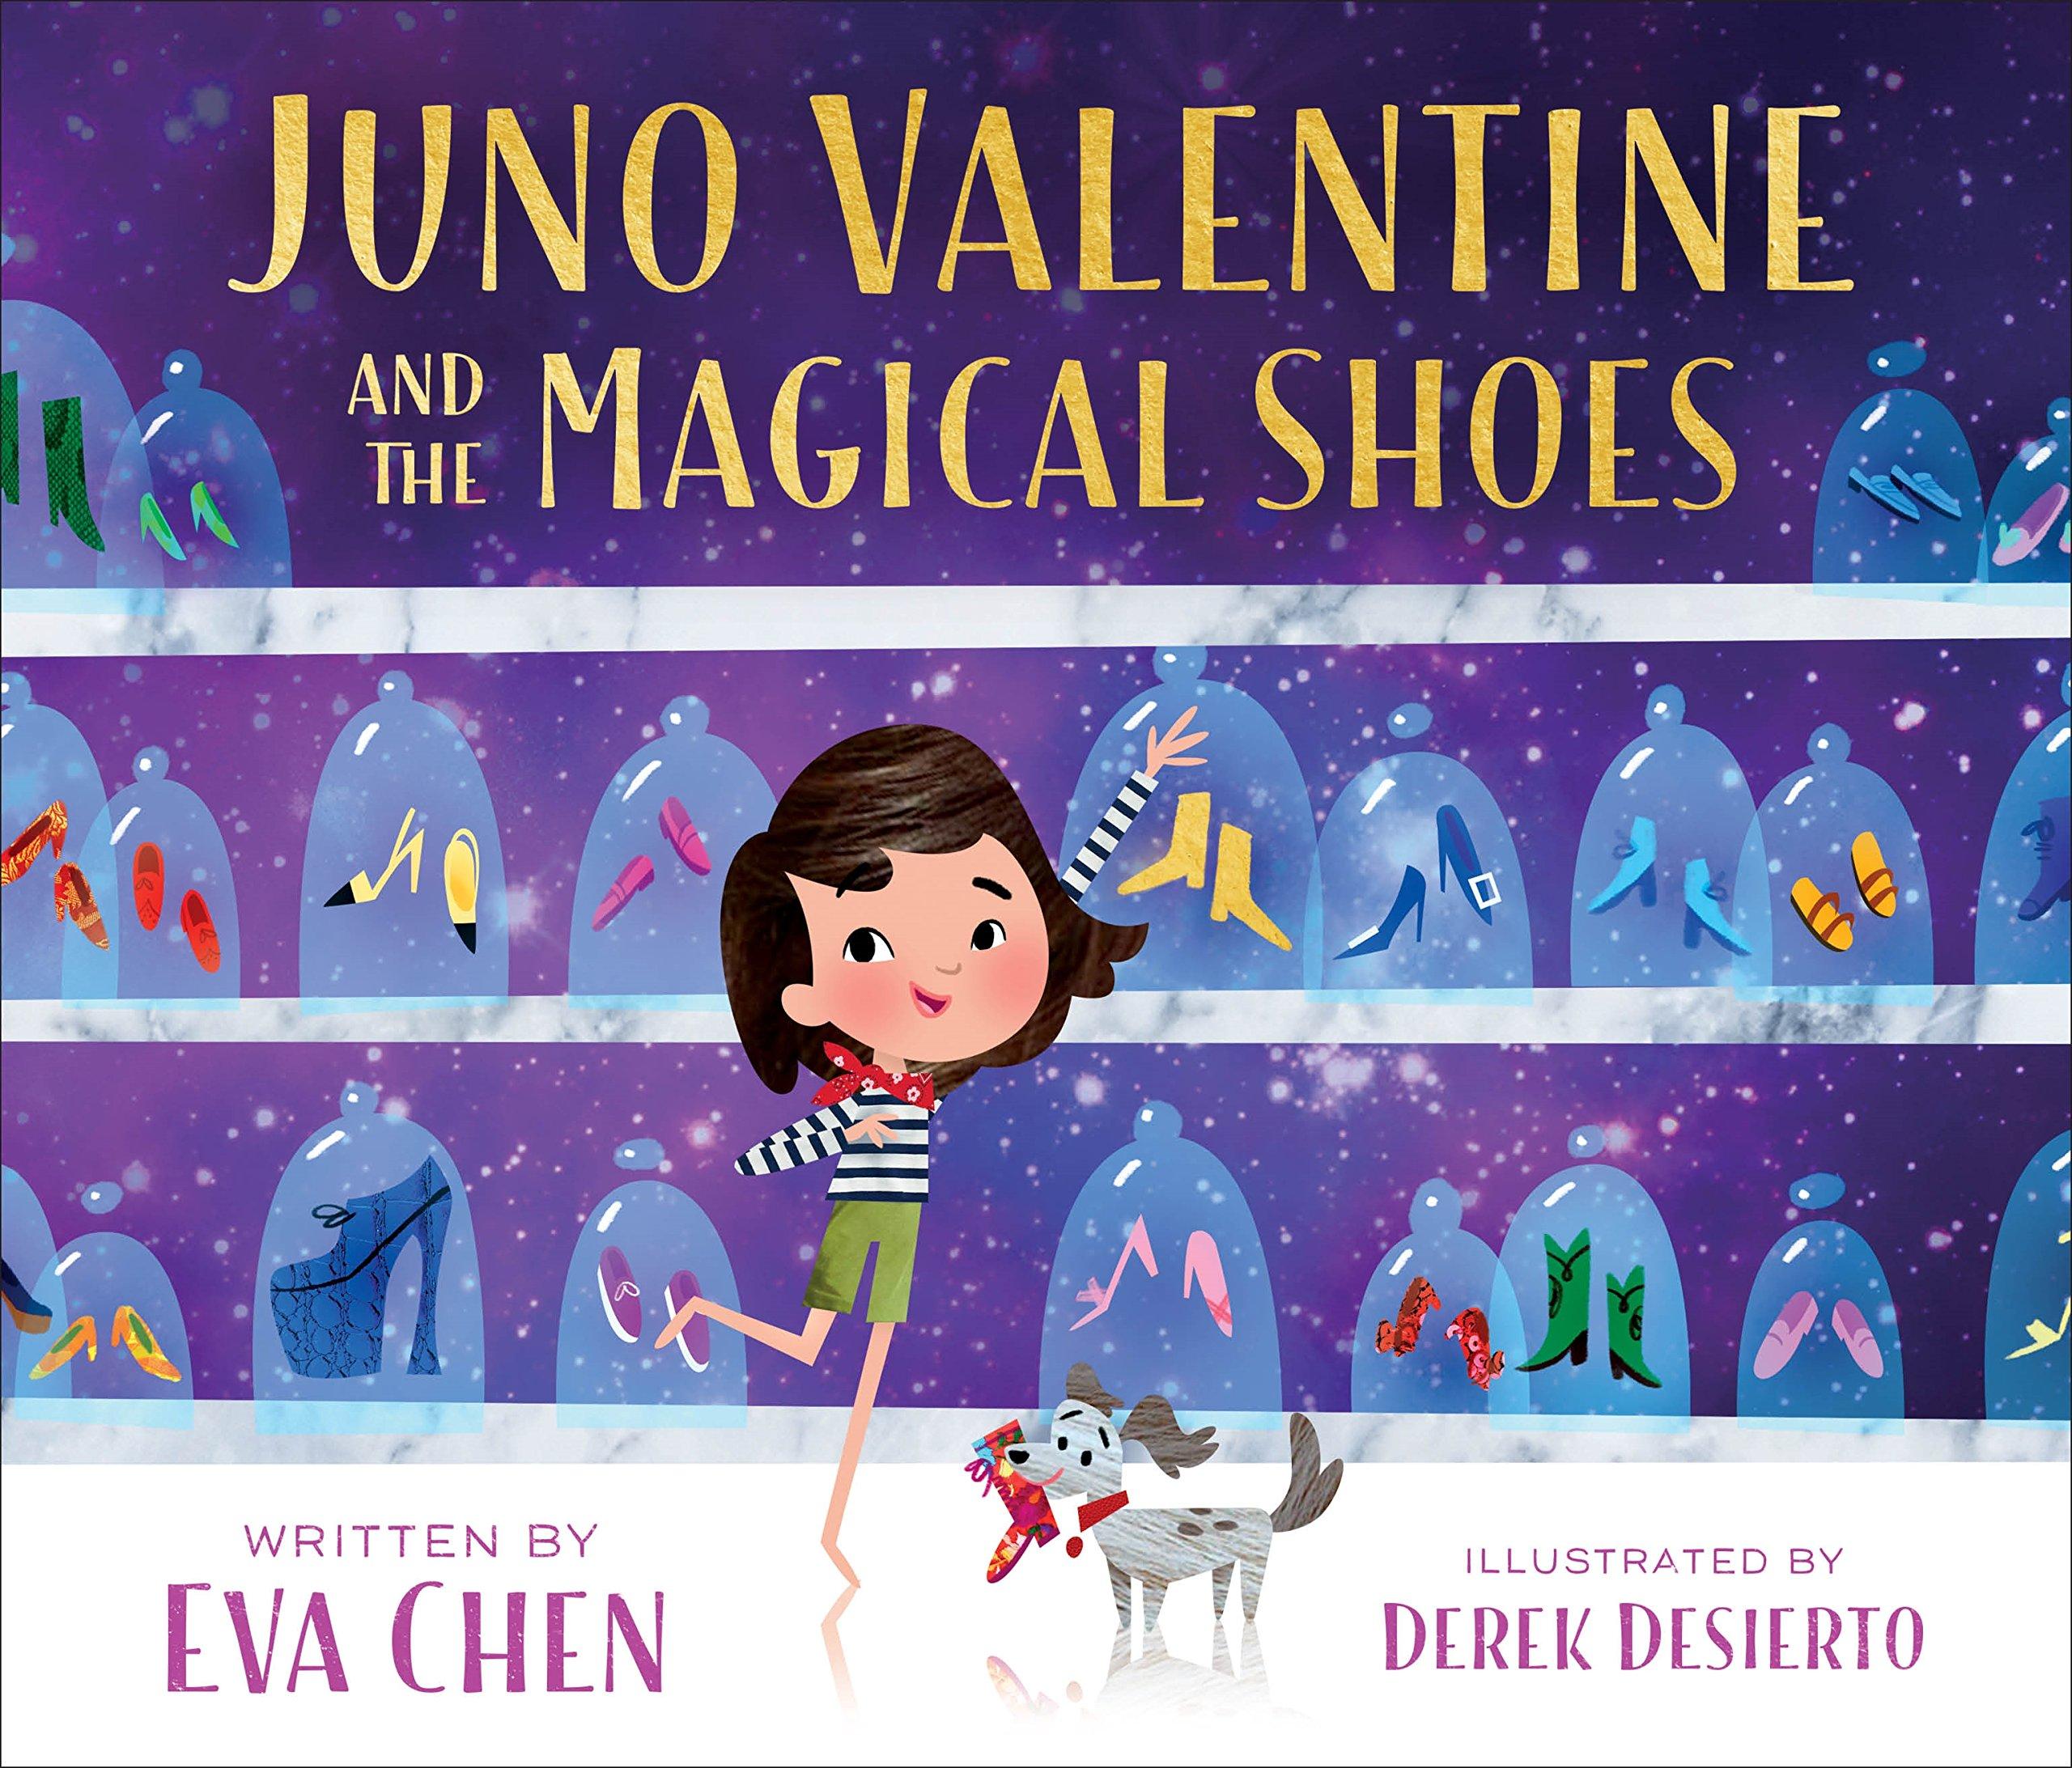 de62695092 Juno Valentine and the Magical Shoes - Livros na Amazon Brasil-  9781250297266